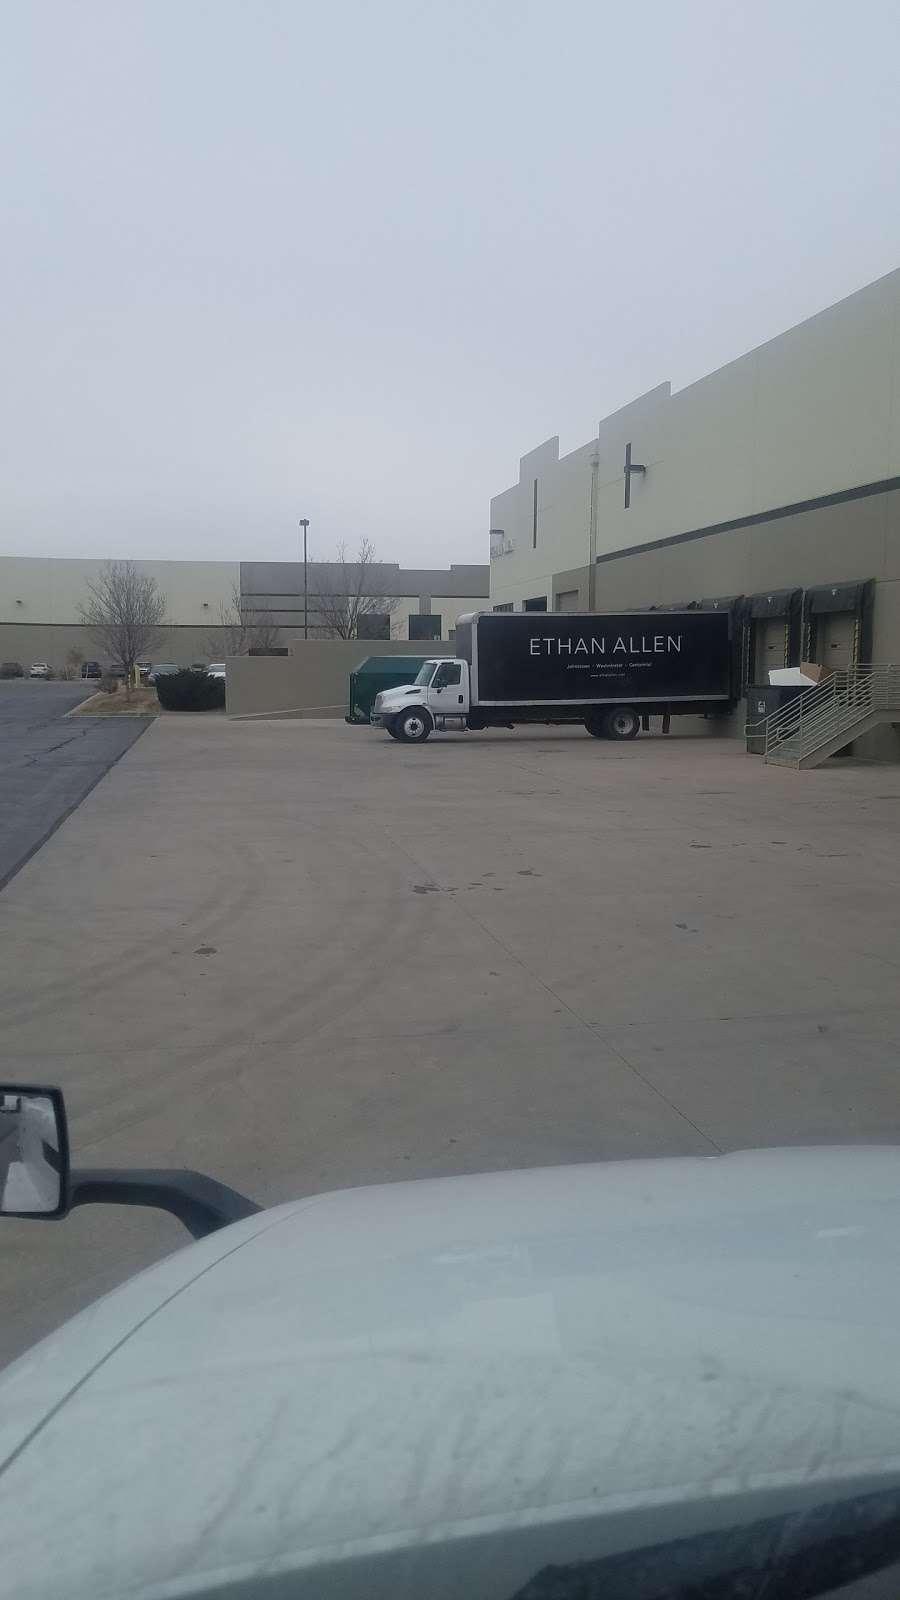 Ethan Allen Warehouse - furniture store    Photo 8 of 8   Address: 19655 E 35th Dr #100, Aurora, CO 80011, USA   Phone: (303) 574-3003